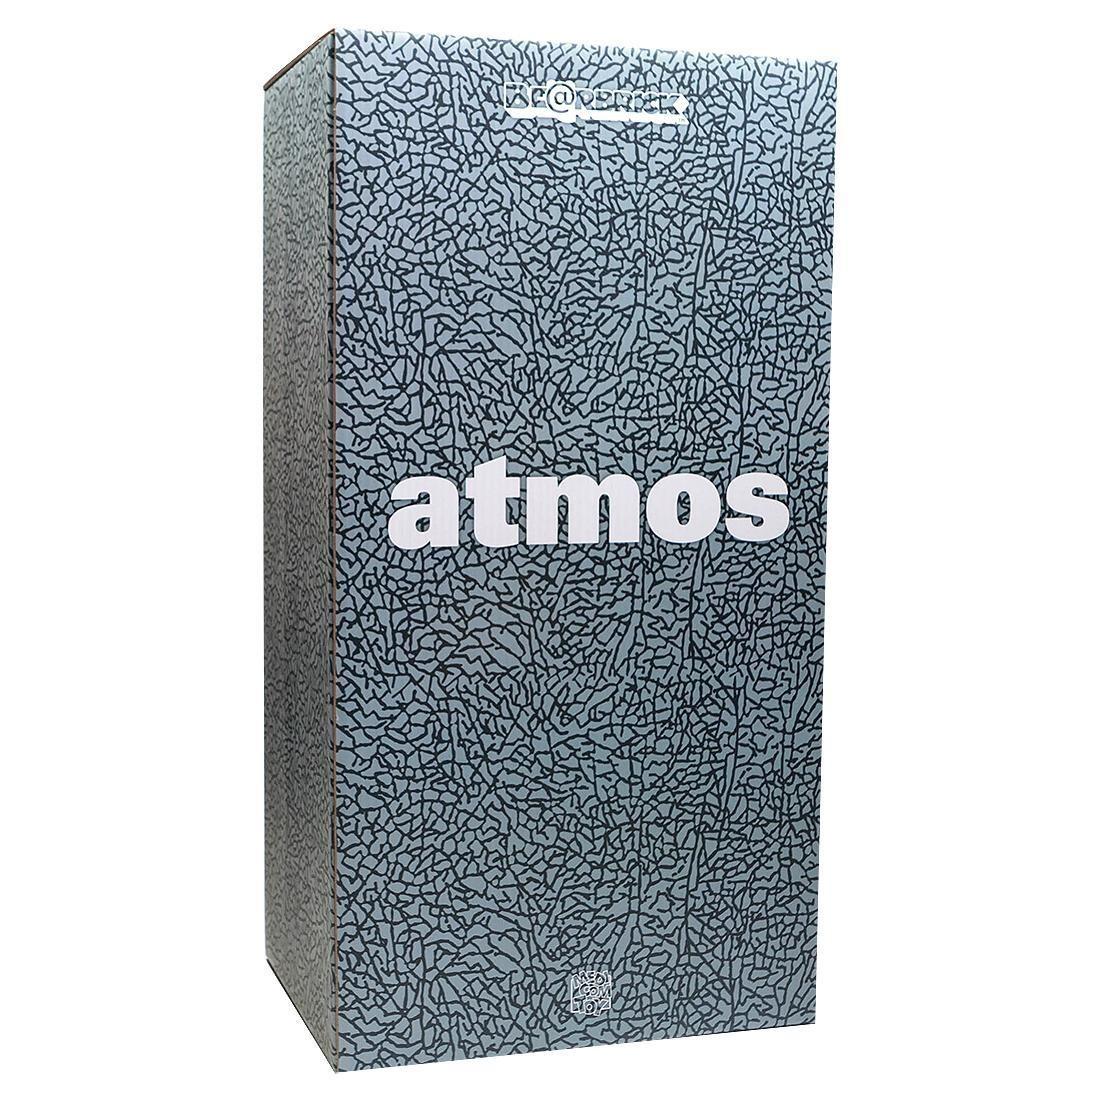 2b6ca4c8b4ca Medicom Atmos Elephant 1000% Bearbrick Figure (gray)